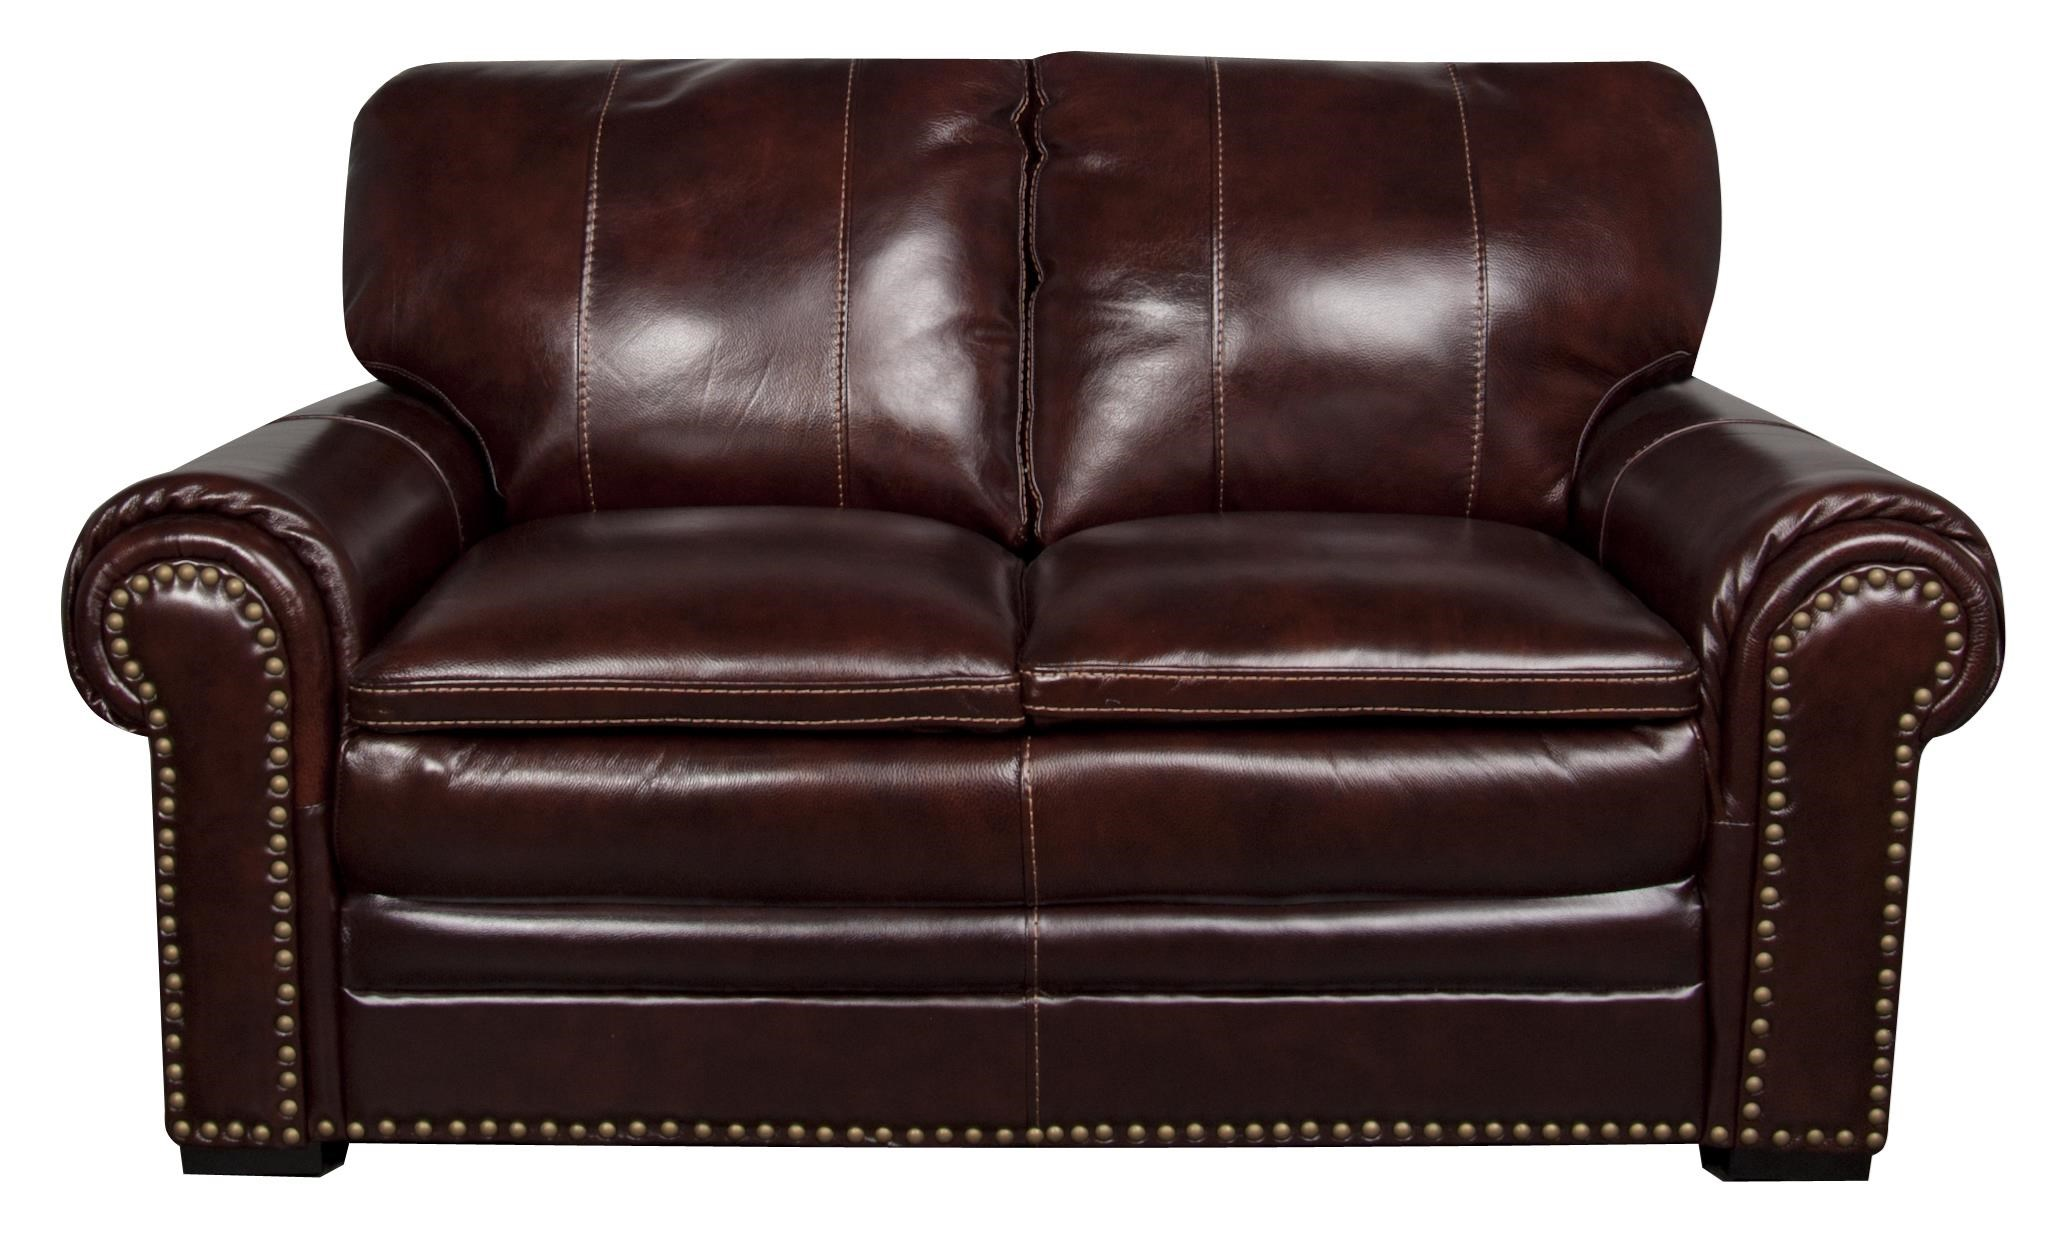 Morris Home Furnishings Elwood Elwood Leather-Match* loveseat - Item Number: 168318979